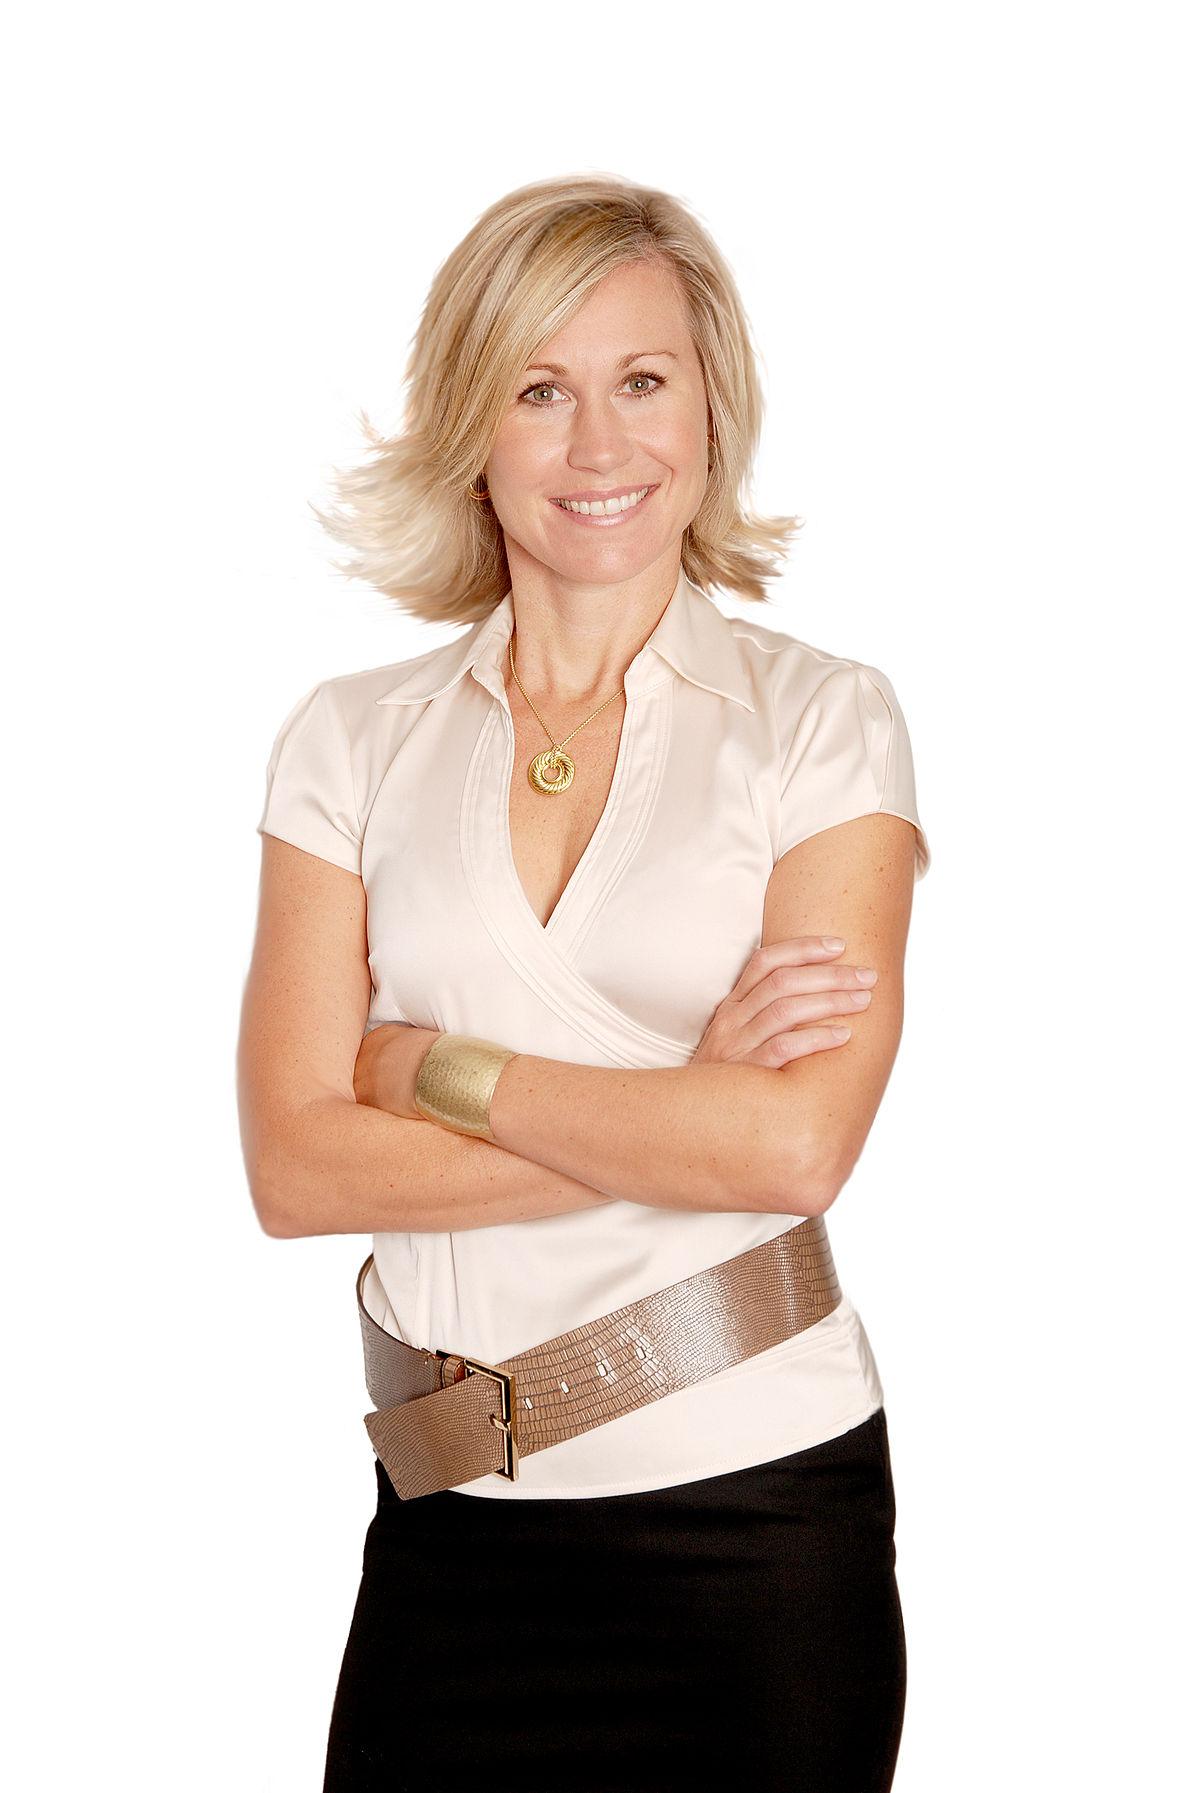 Jennifer Keesmaat - Wikipedia